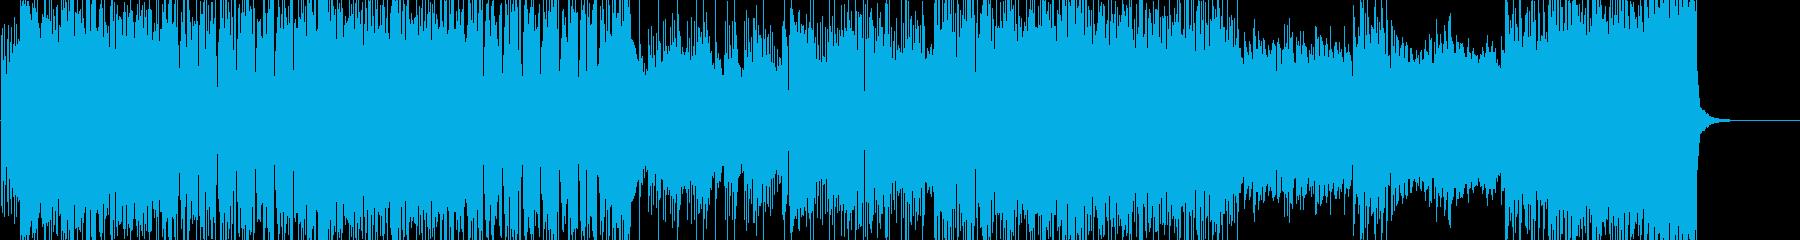 「HR/HM」「激しい」BGM47の再生済みの波形